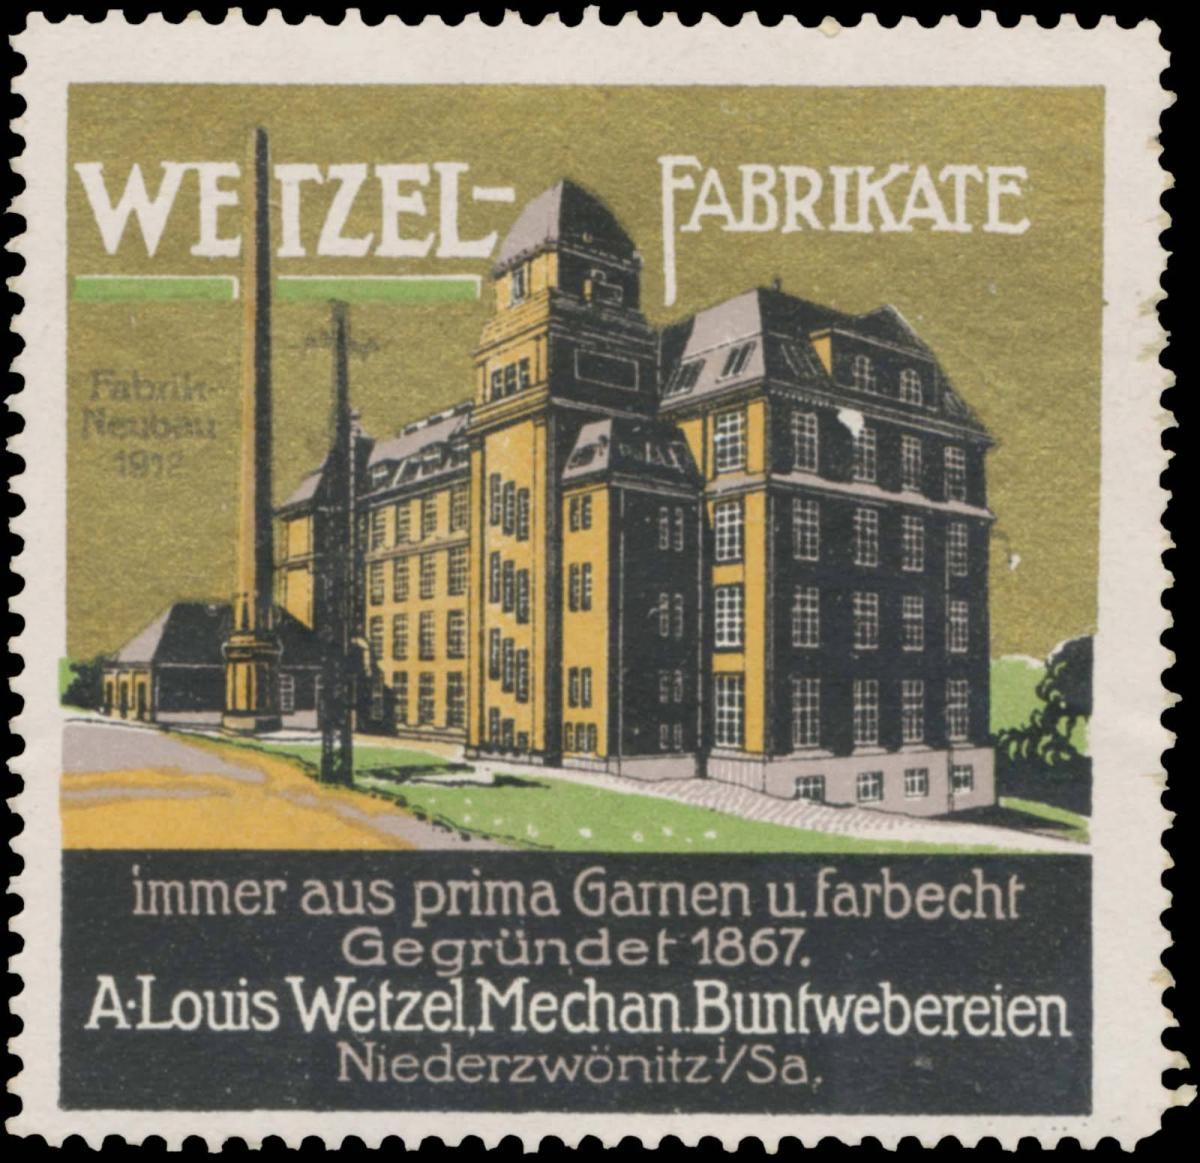 Wetzel-Fabrikate